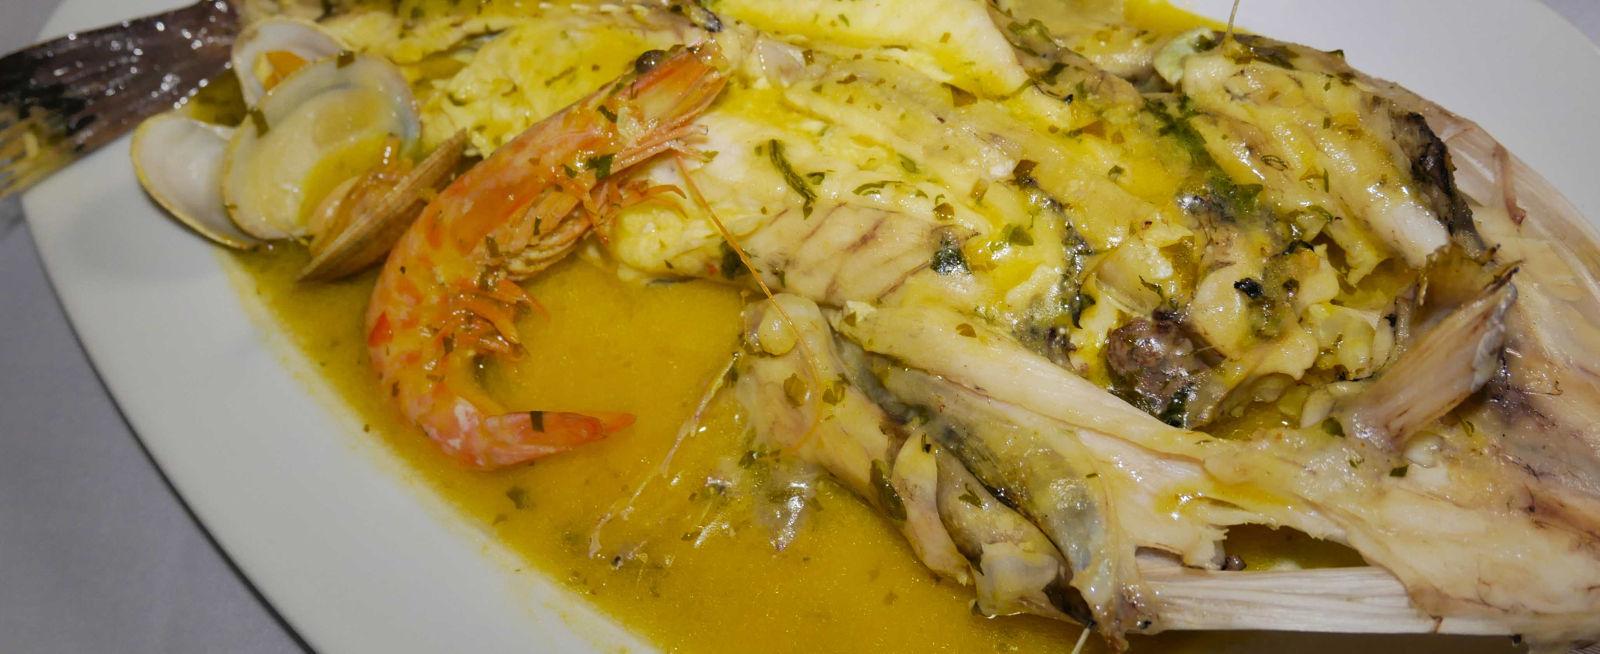 Pixin marinero Restaurante Casa Parrondo